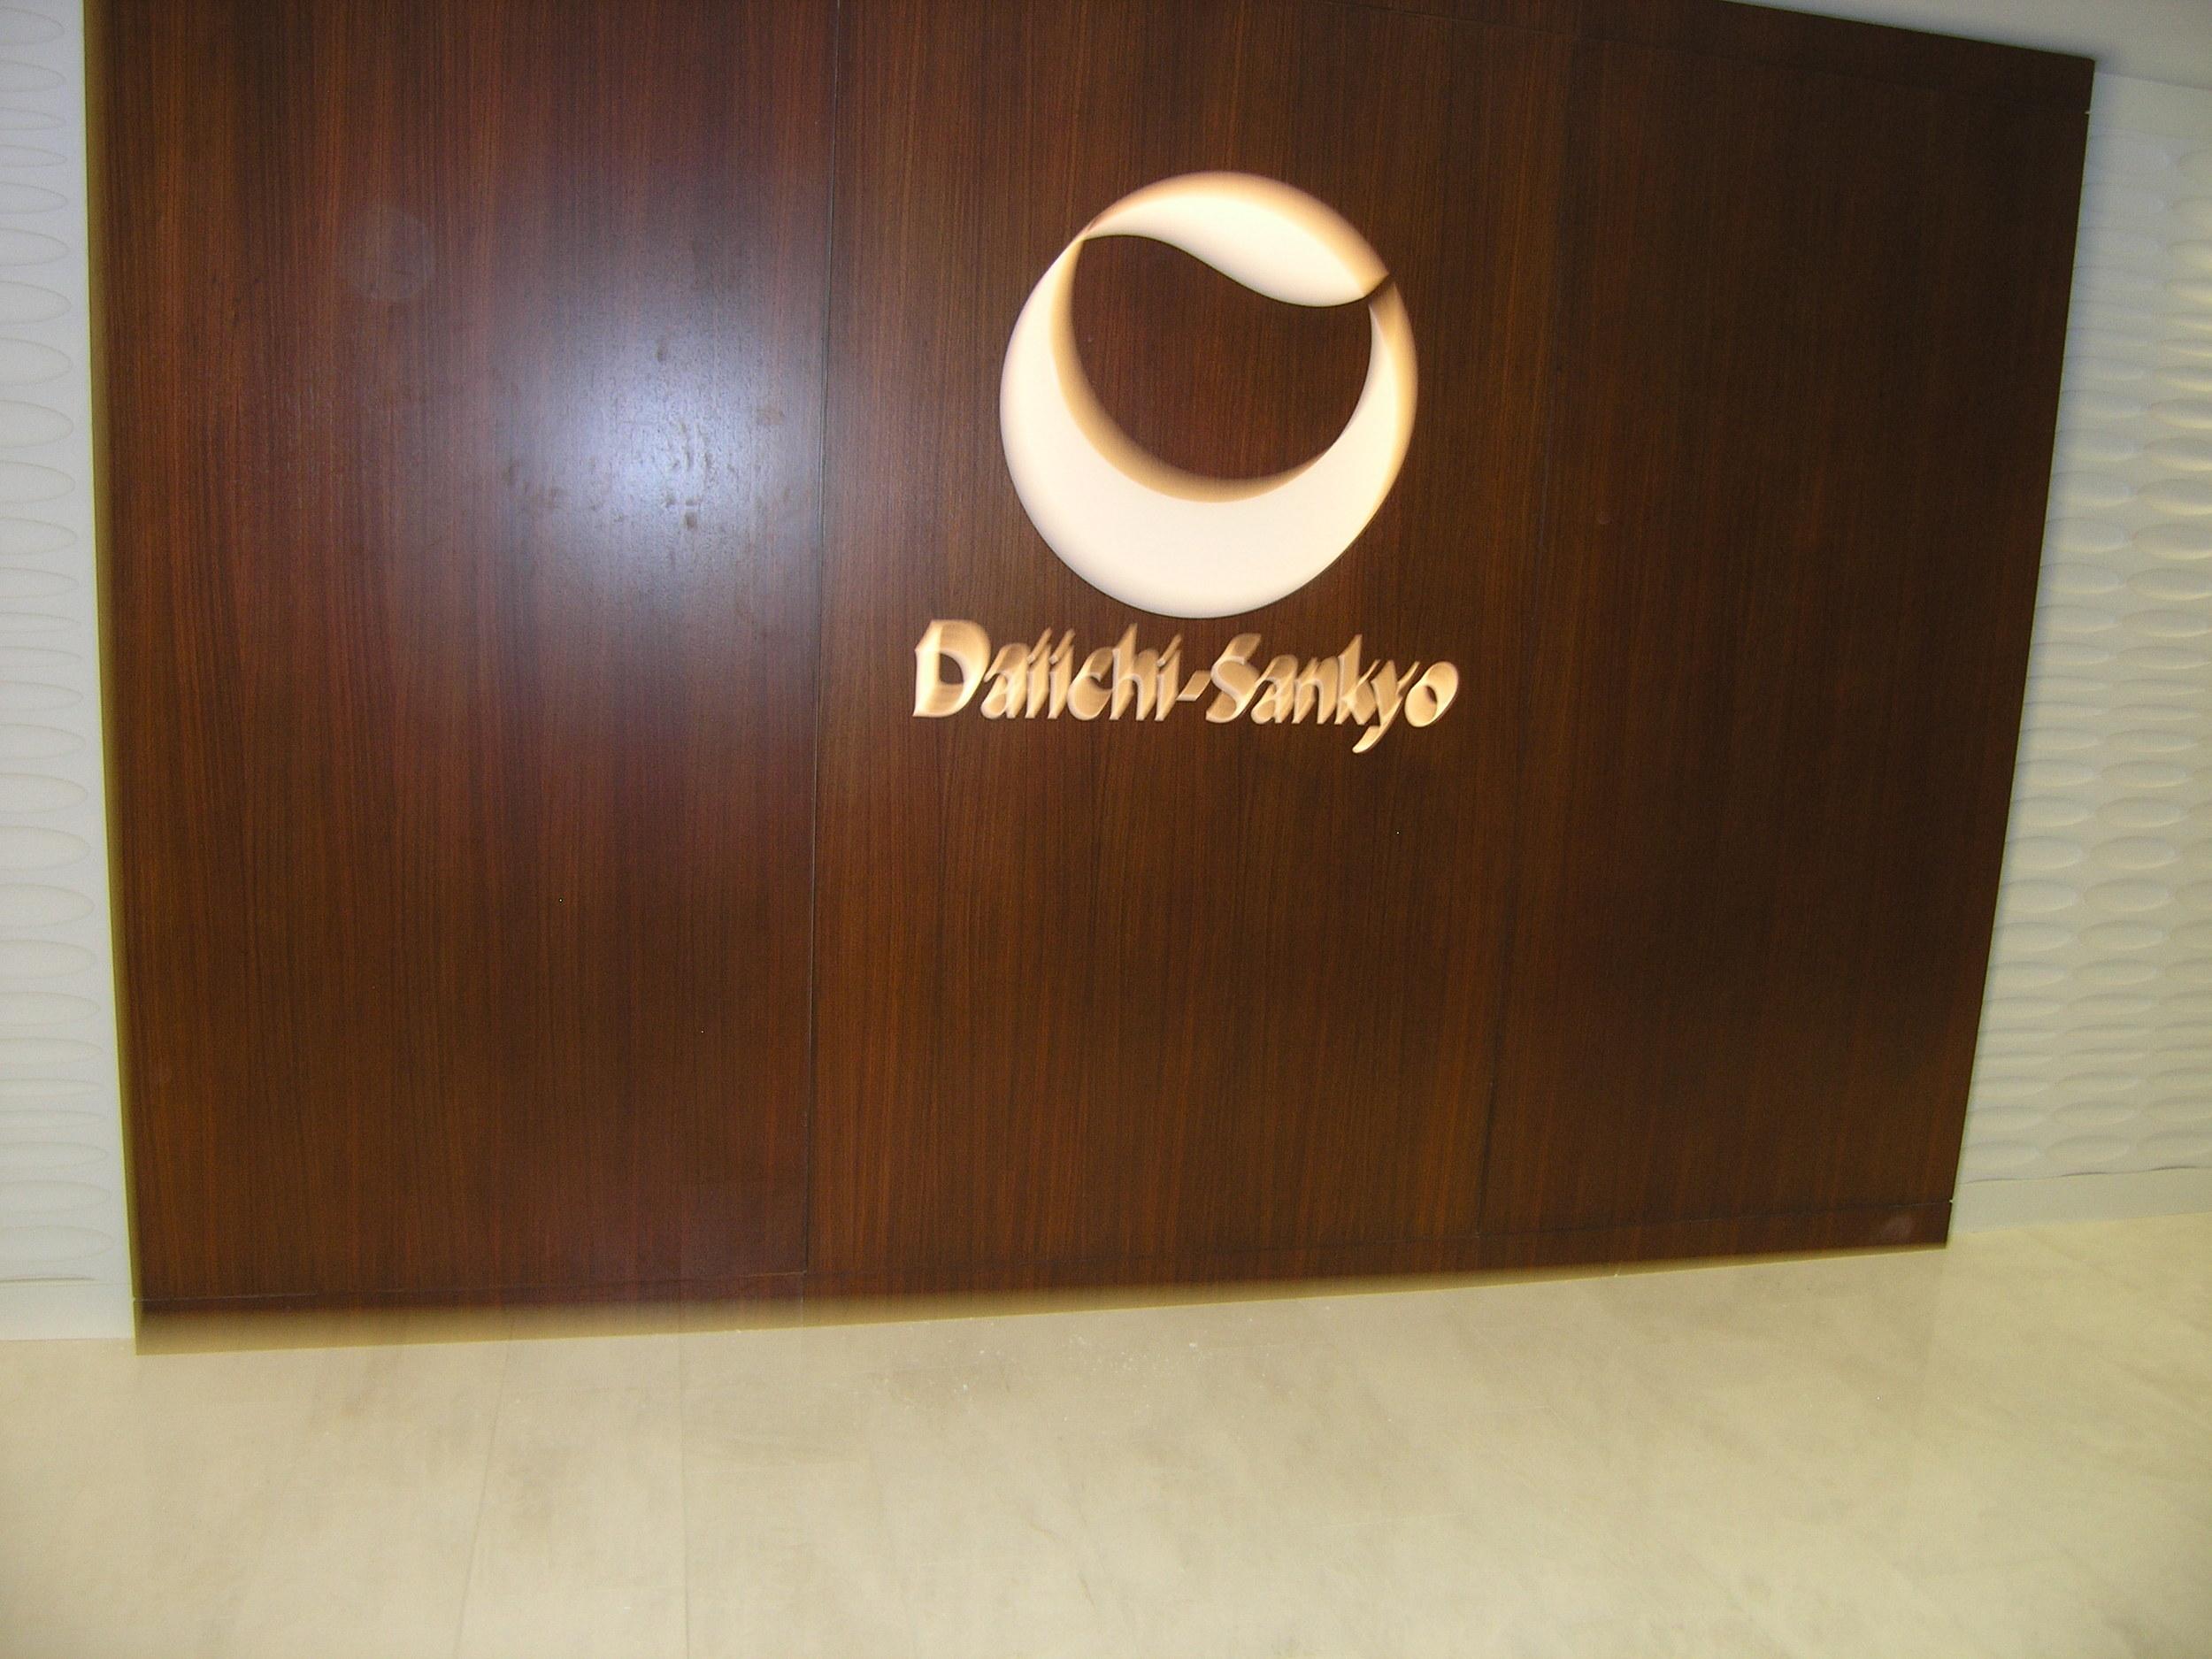 m_projects_0- Old Jobs_Daiichi Sankyo_DAIICHI SANKIO JOB 15143_PIX_Final_P1260251.JPG